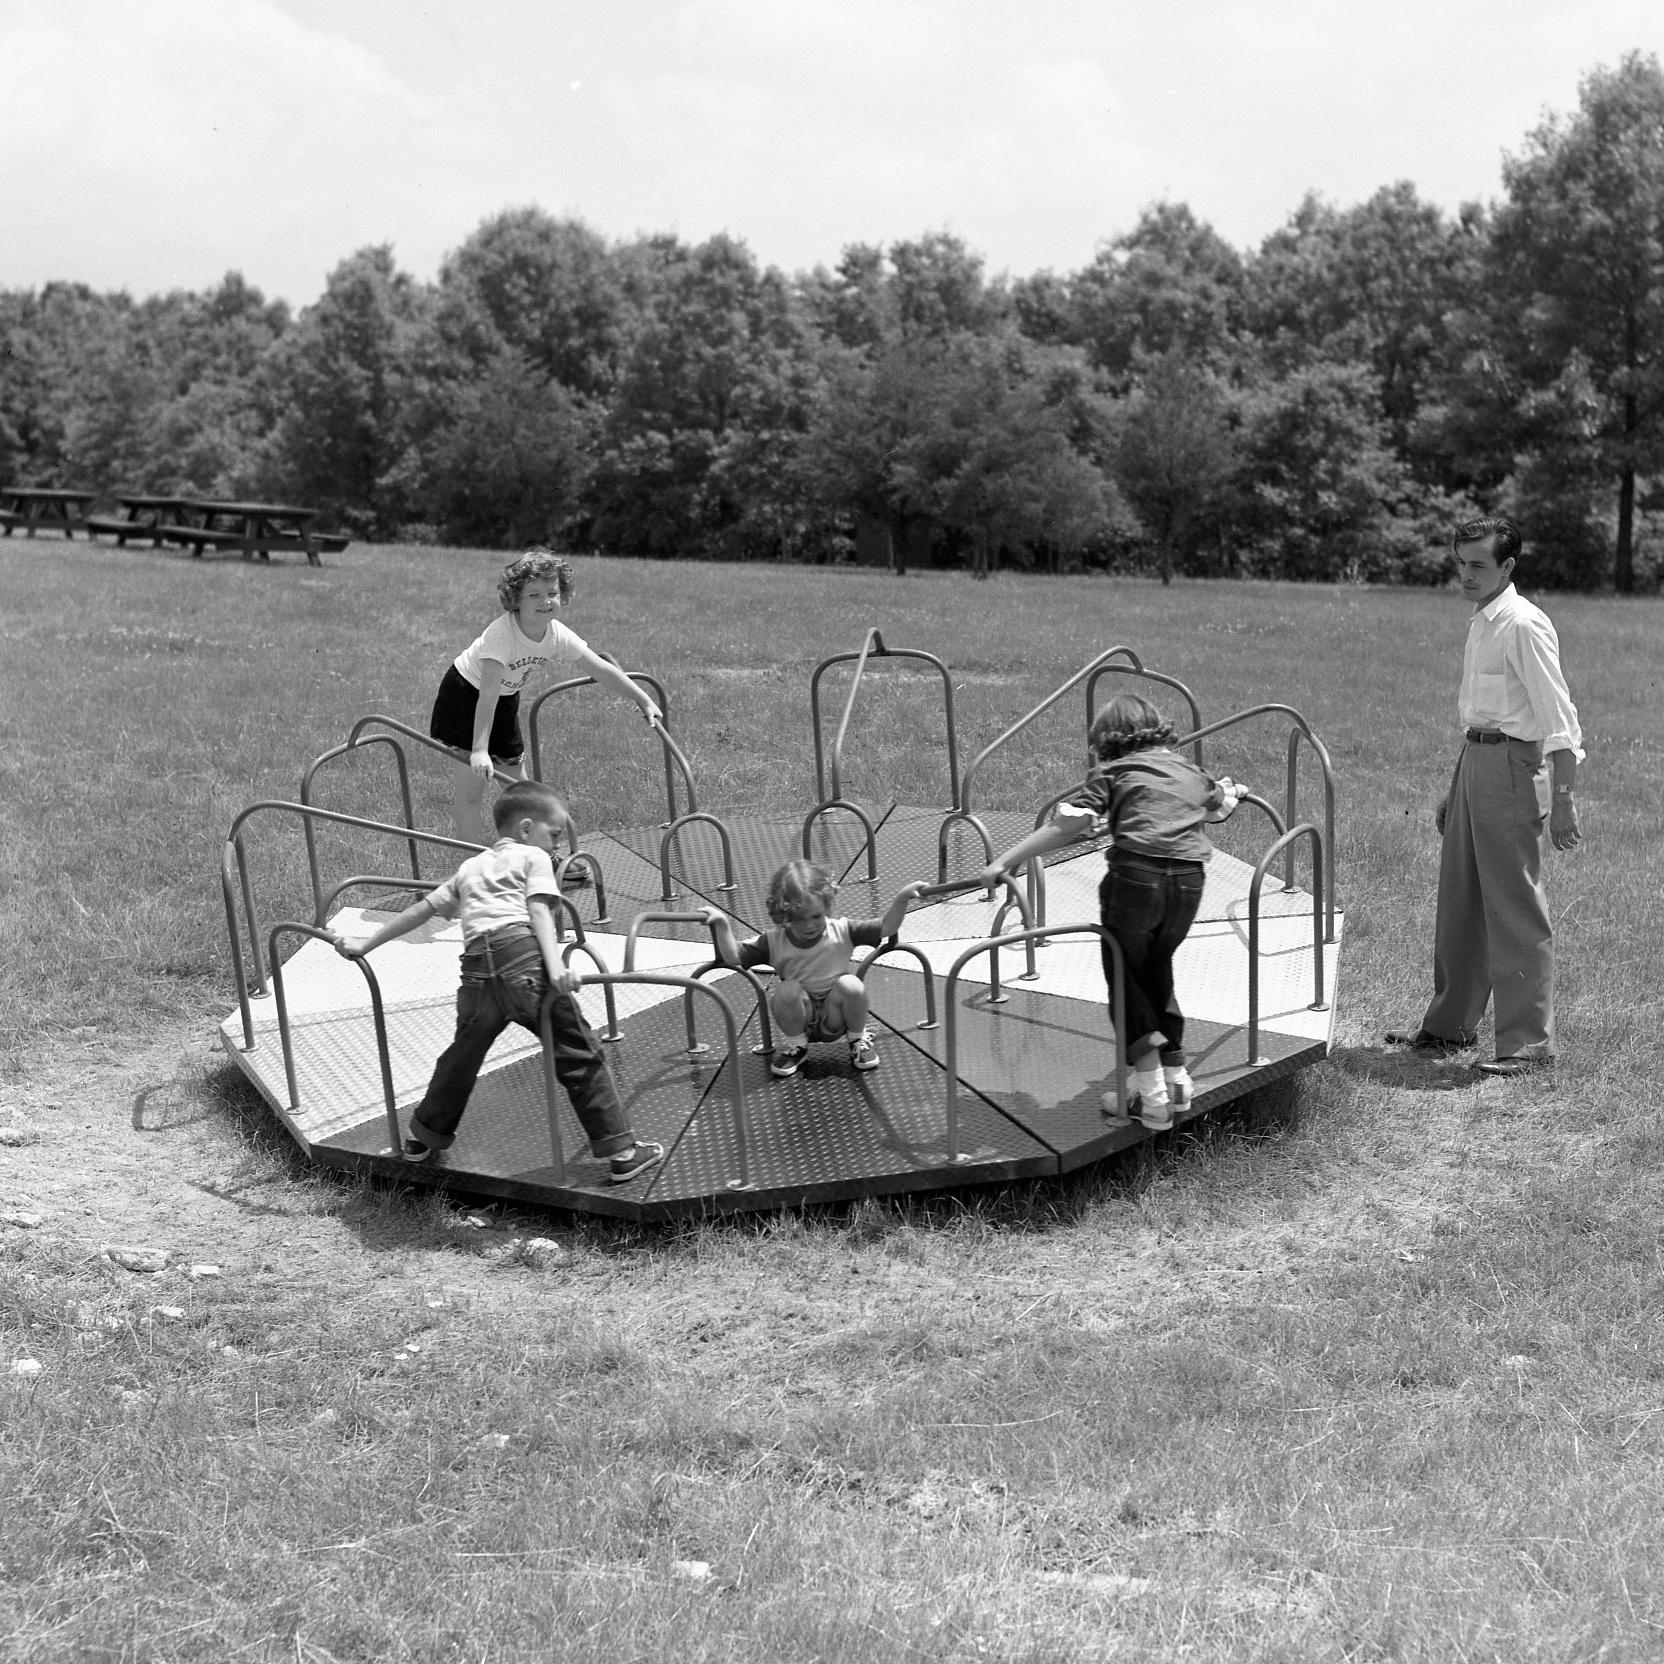 retro playground